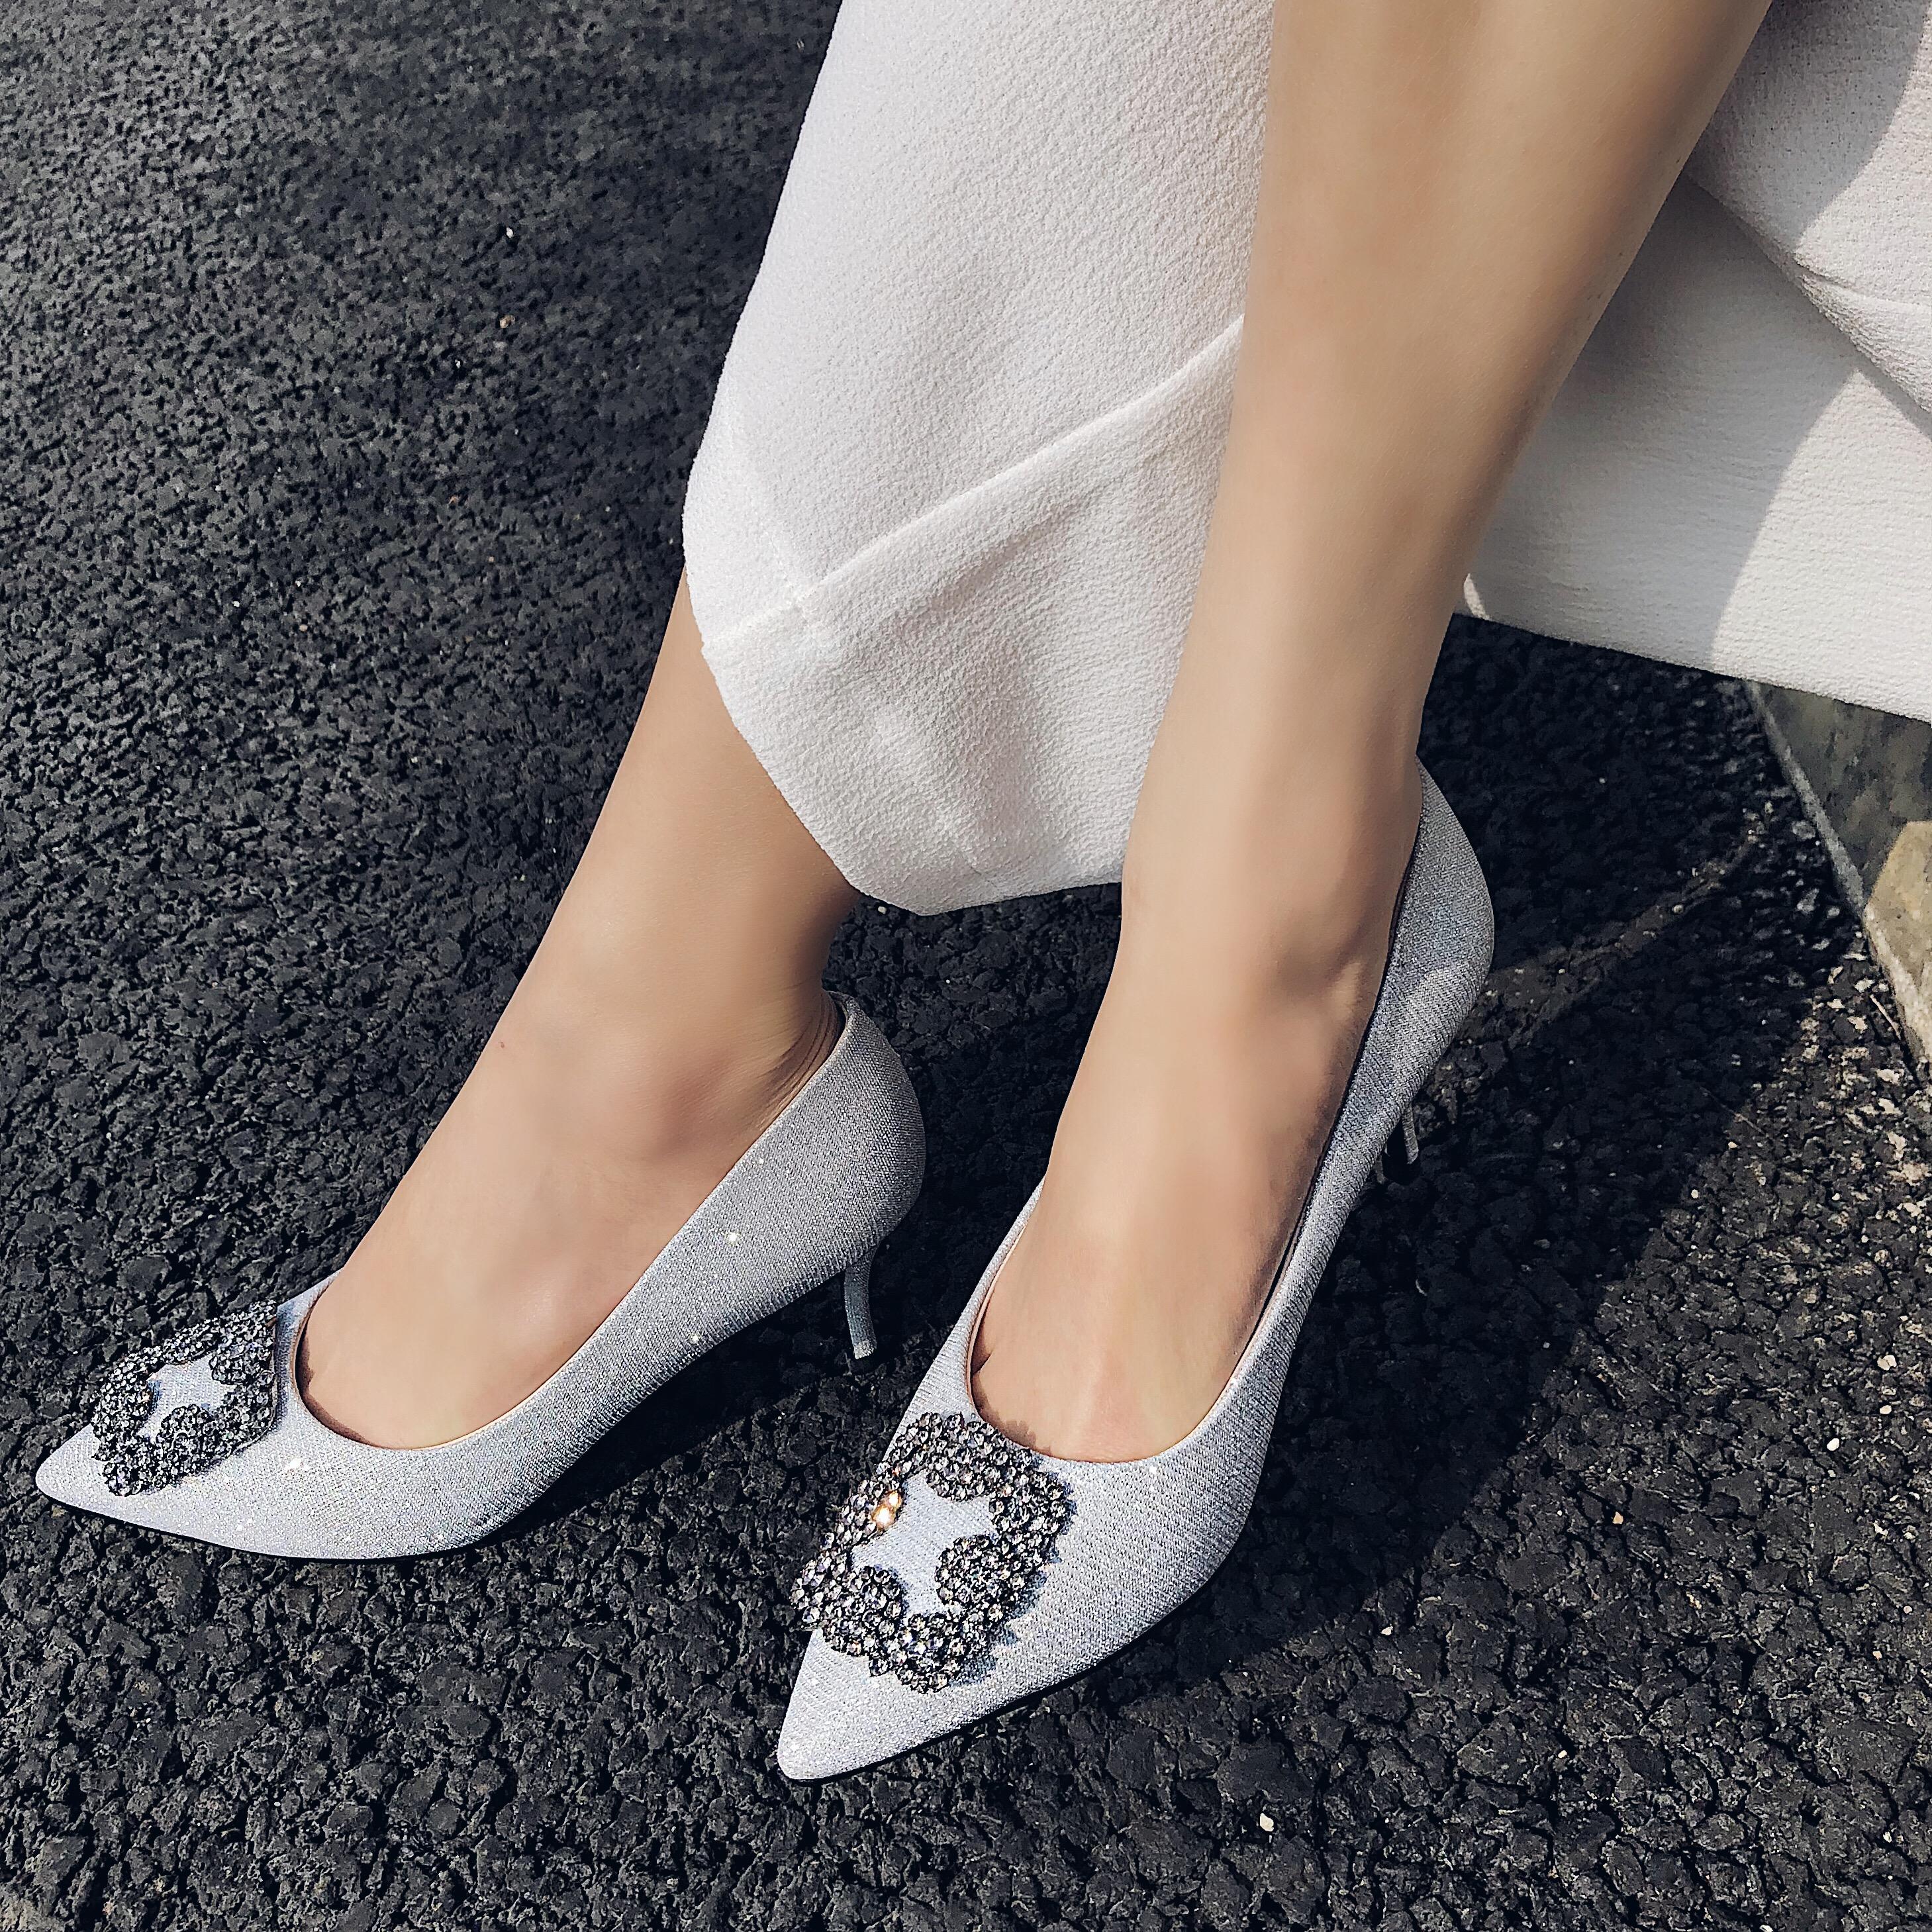 d7282c87bca9e4 US  60 - Arden Furtado new 2018 spring autumn slip on office lady pumps bling  bling crystal high heels 7cm sexy silver elegant stilettos -  www.ardenfurtado. ...